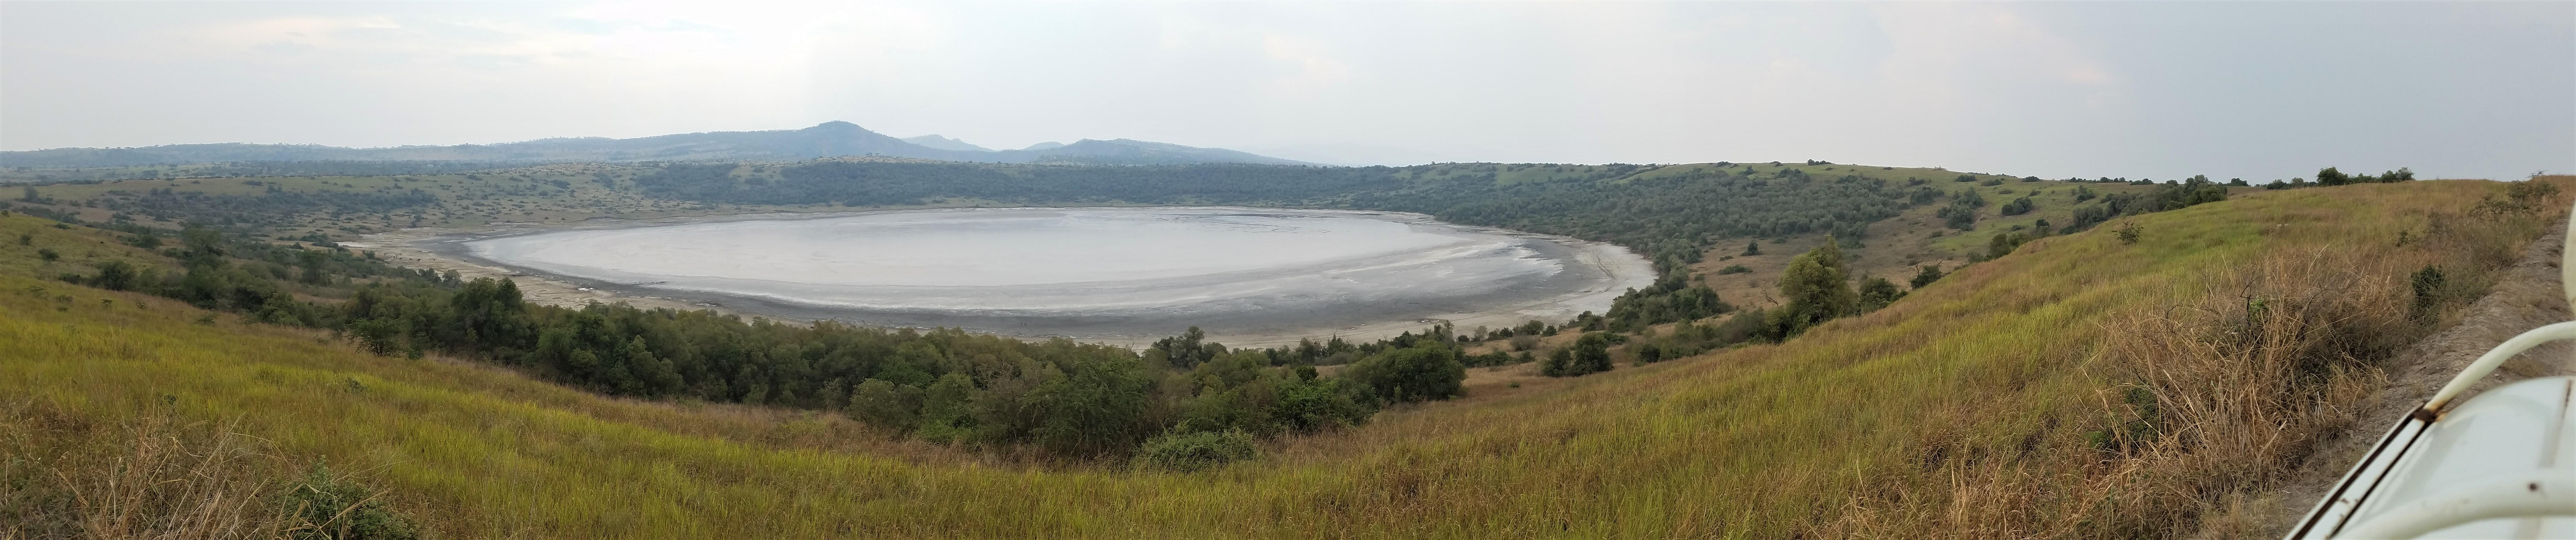 Uganda, Red Chili, Queen Elizabeth National Park, salt lake, volcanic crater, crater